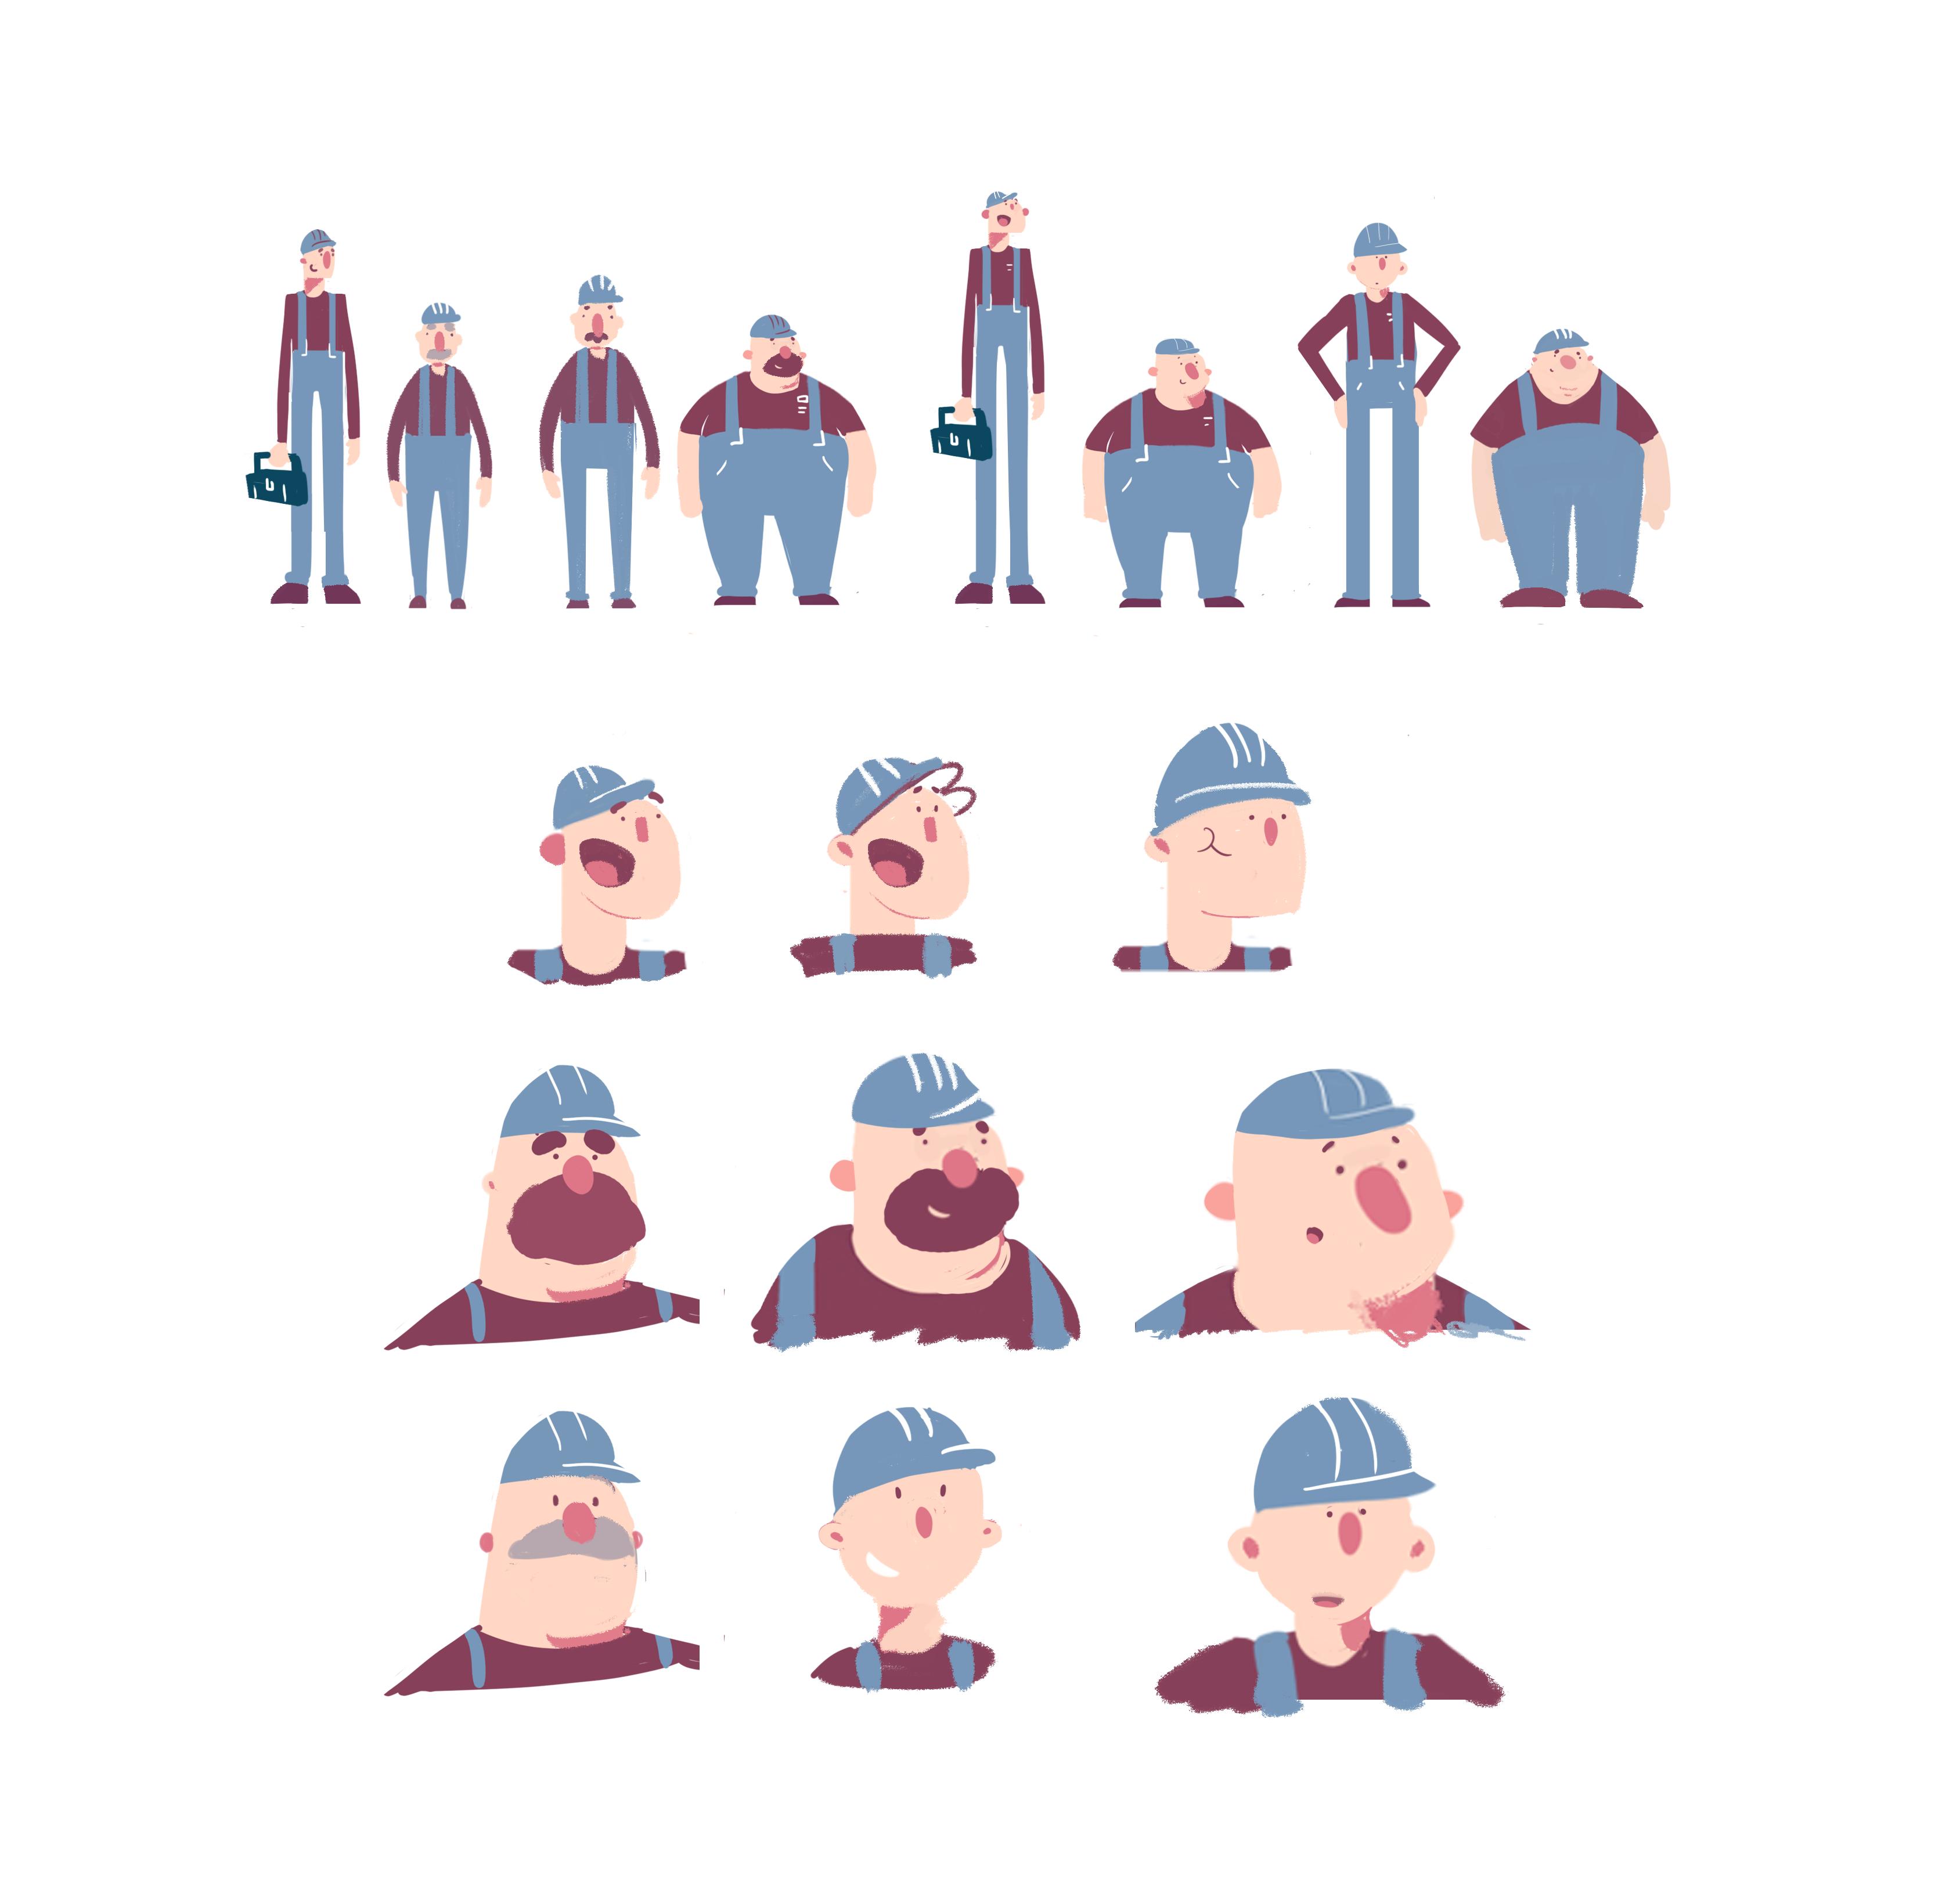 character_explore_03